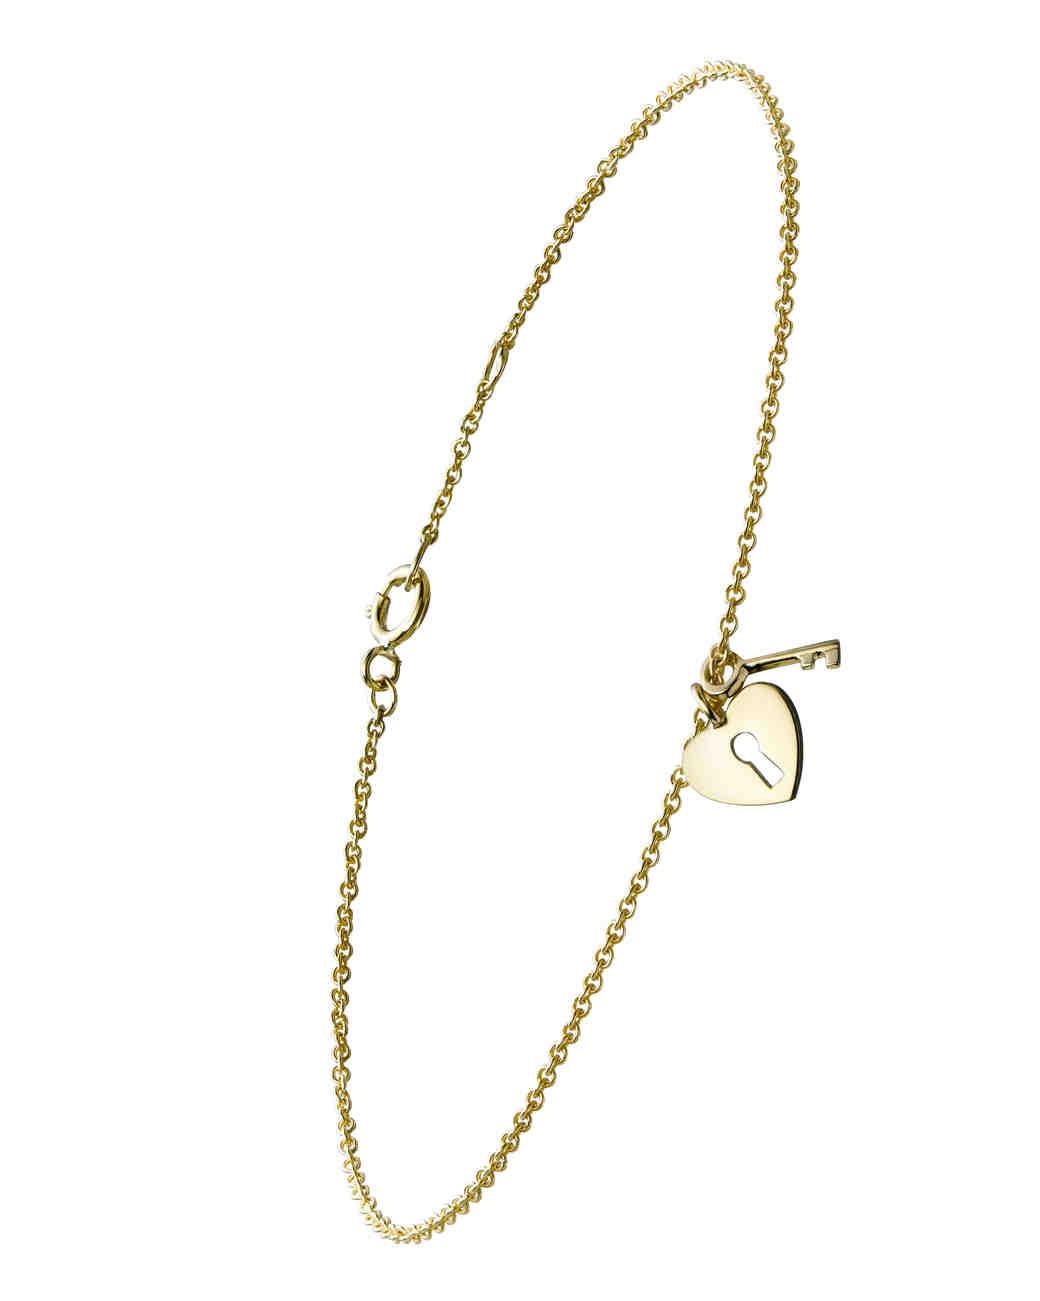 valentines-gift-guide-her-minor-obsessions-bracelet-0115.jpg